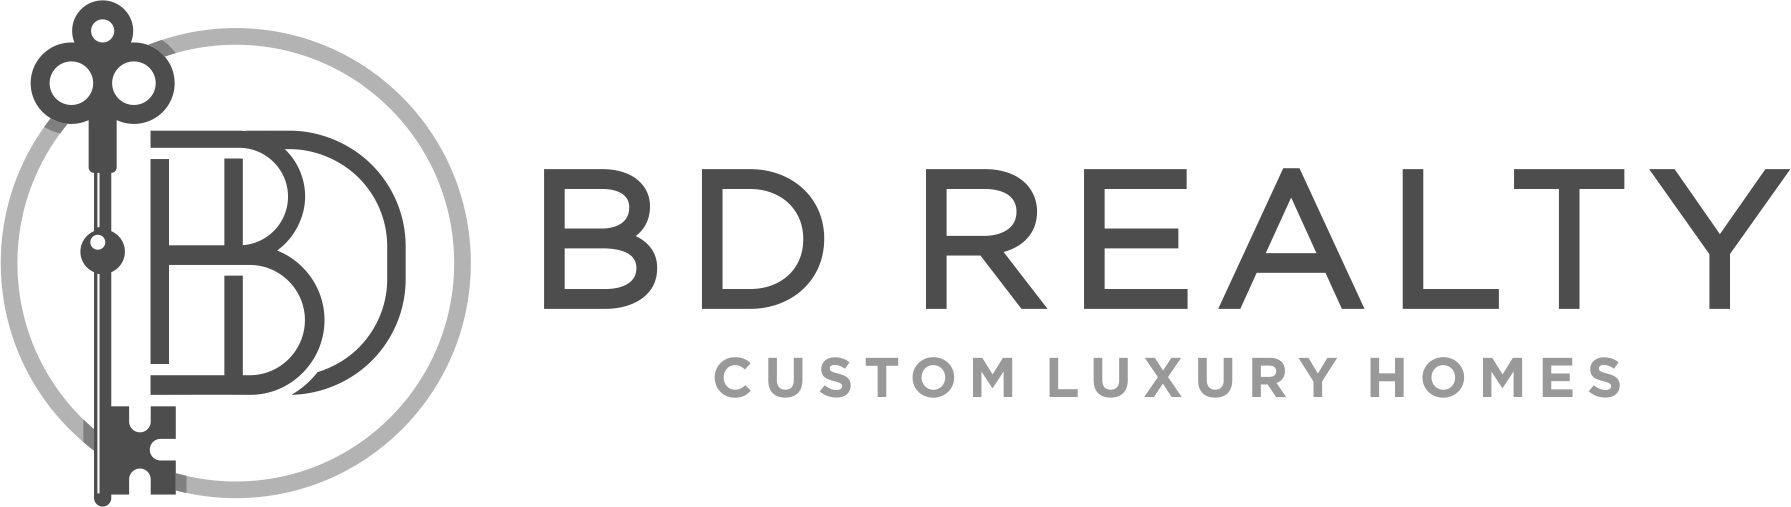 BD Realty logo 2